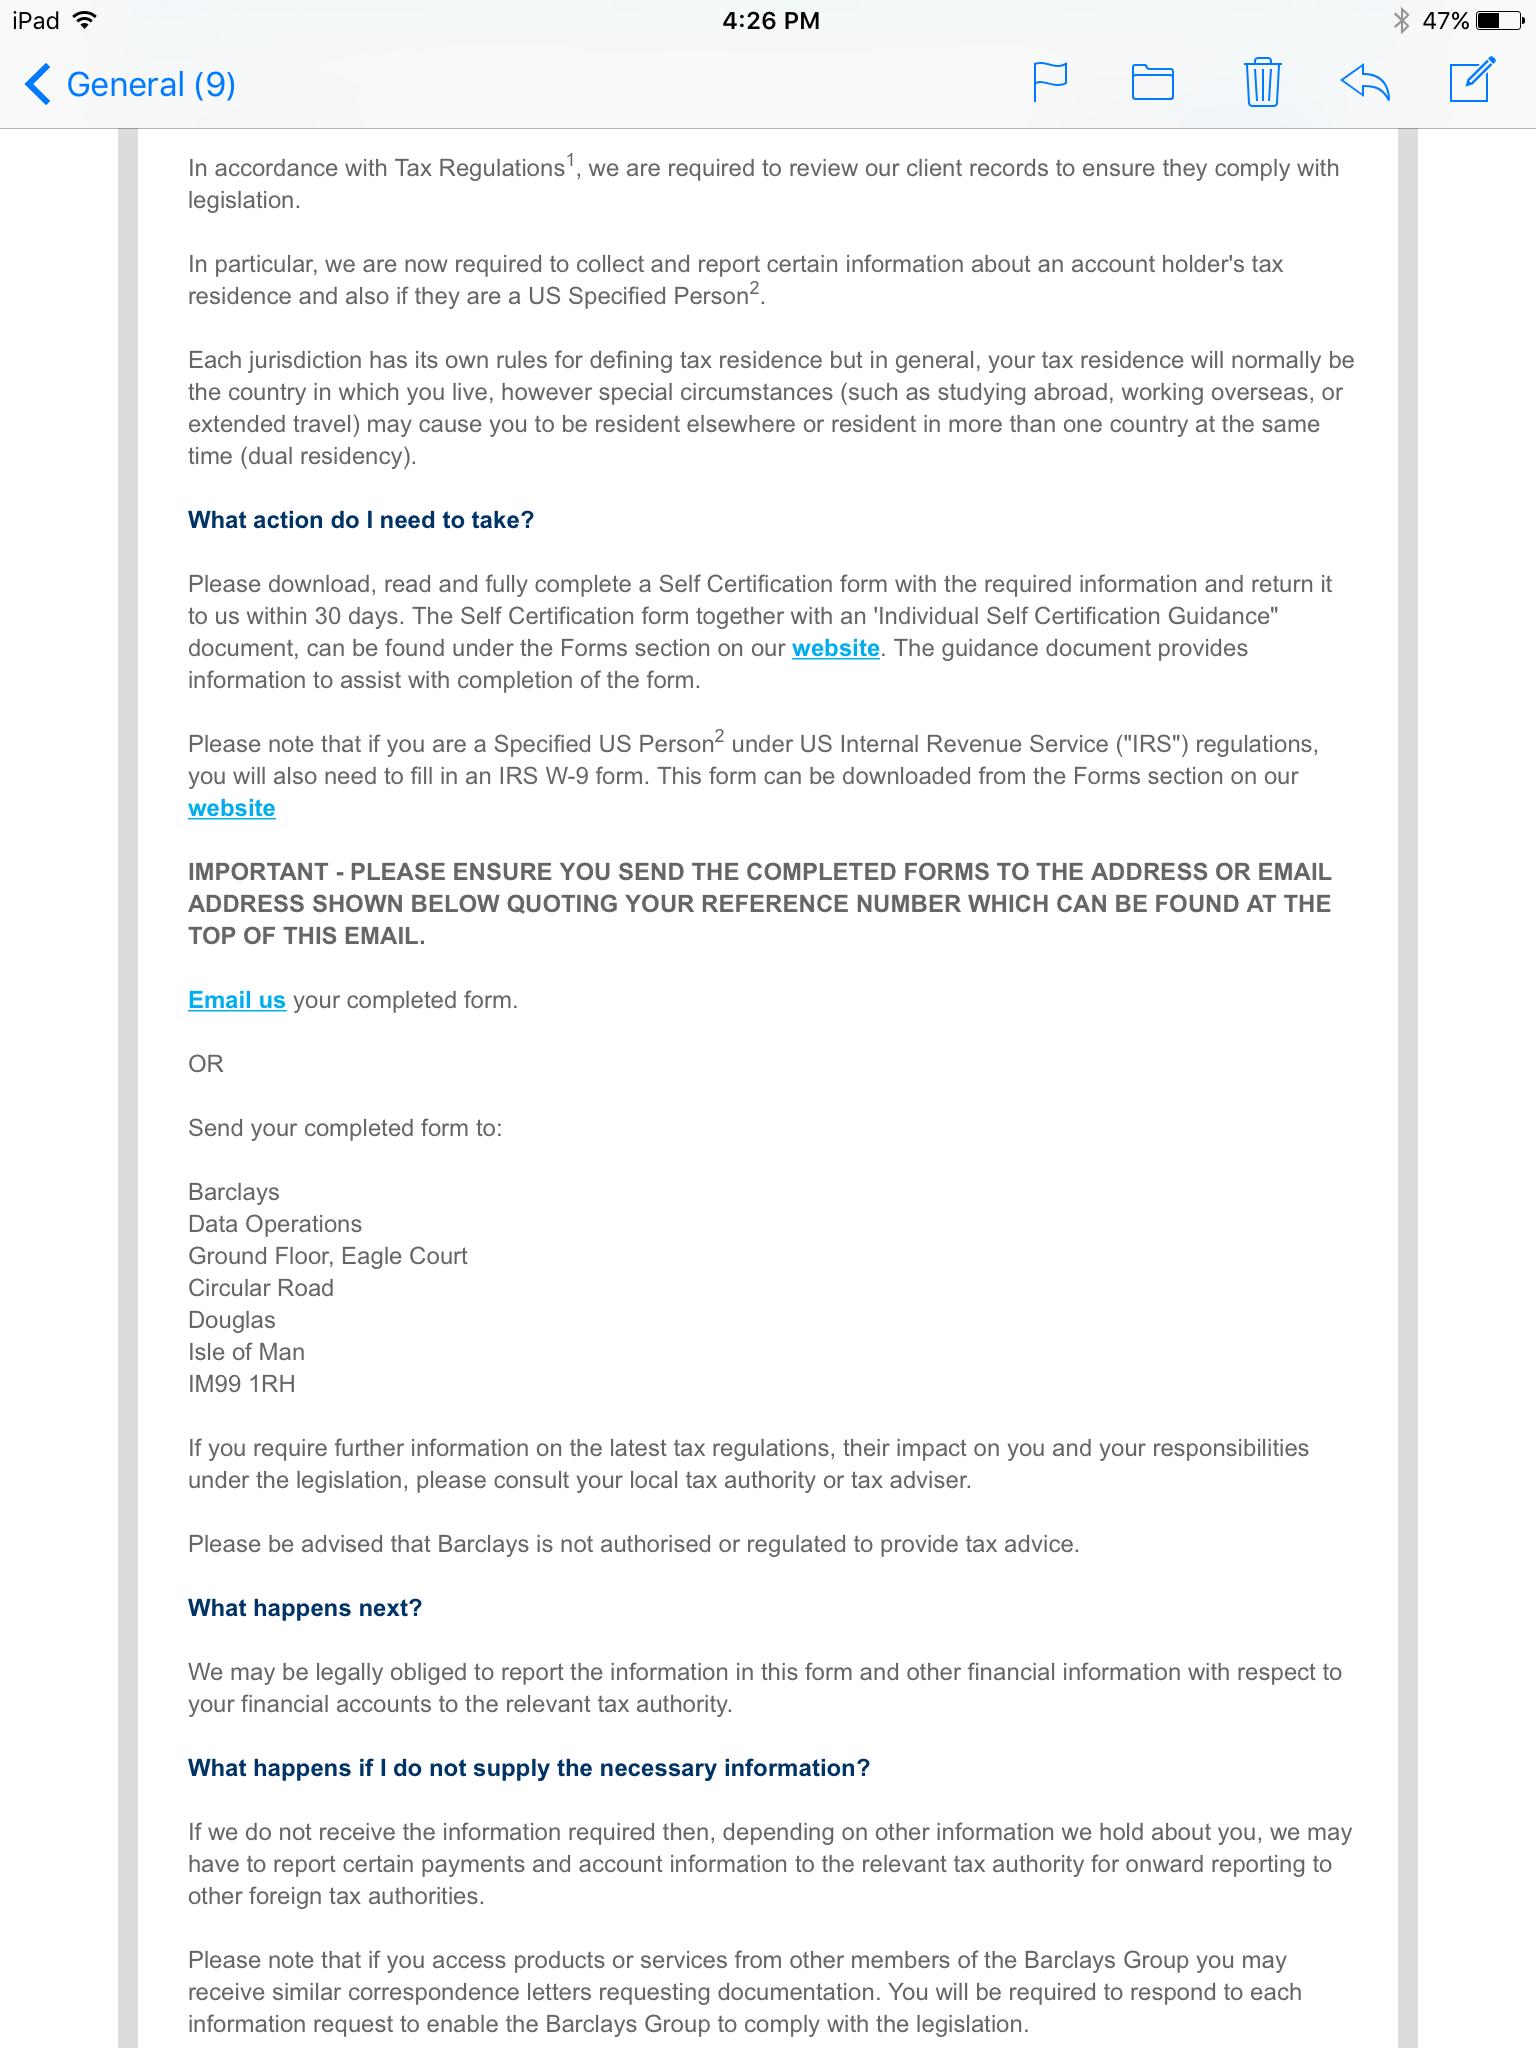 International Tax Compliance Regulations Self Certification Form